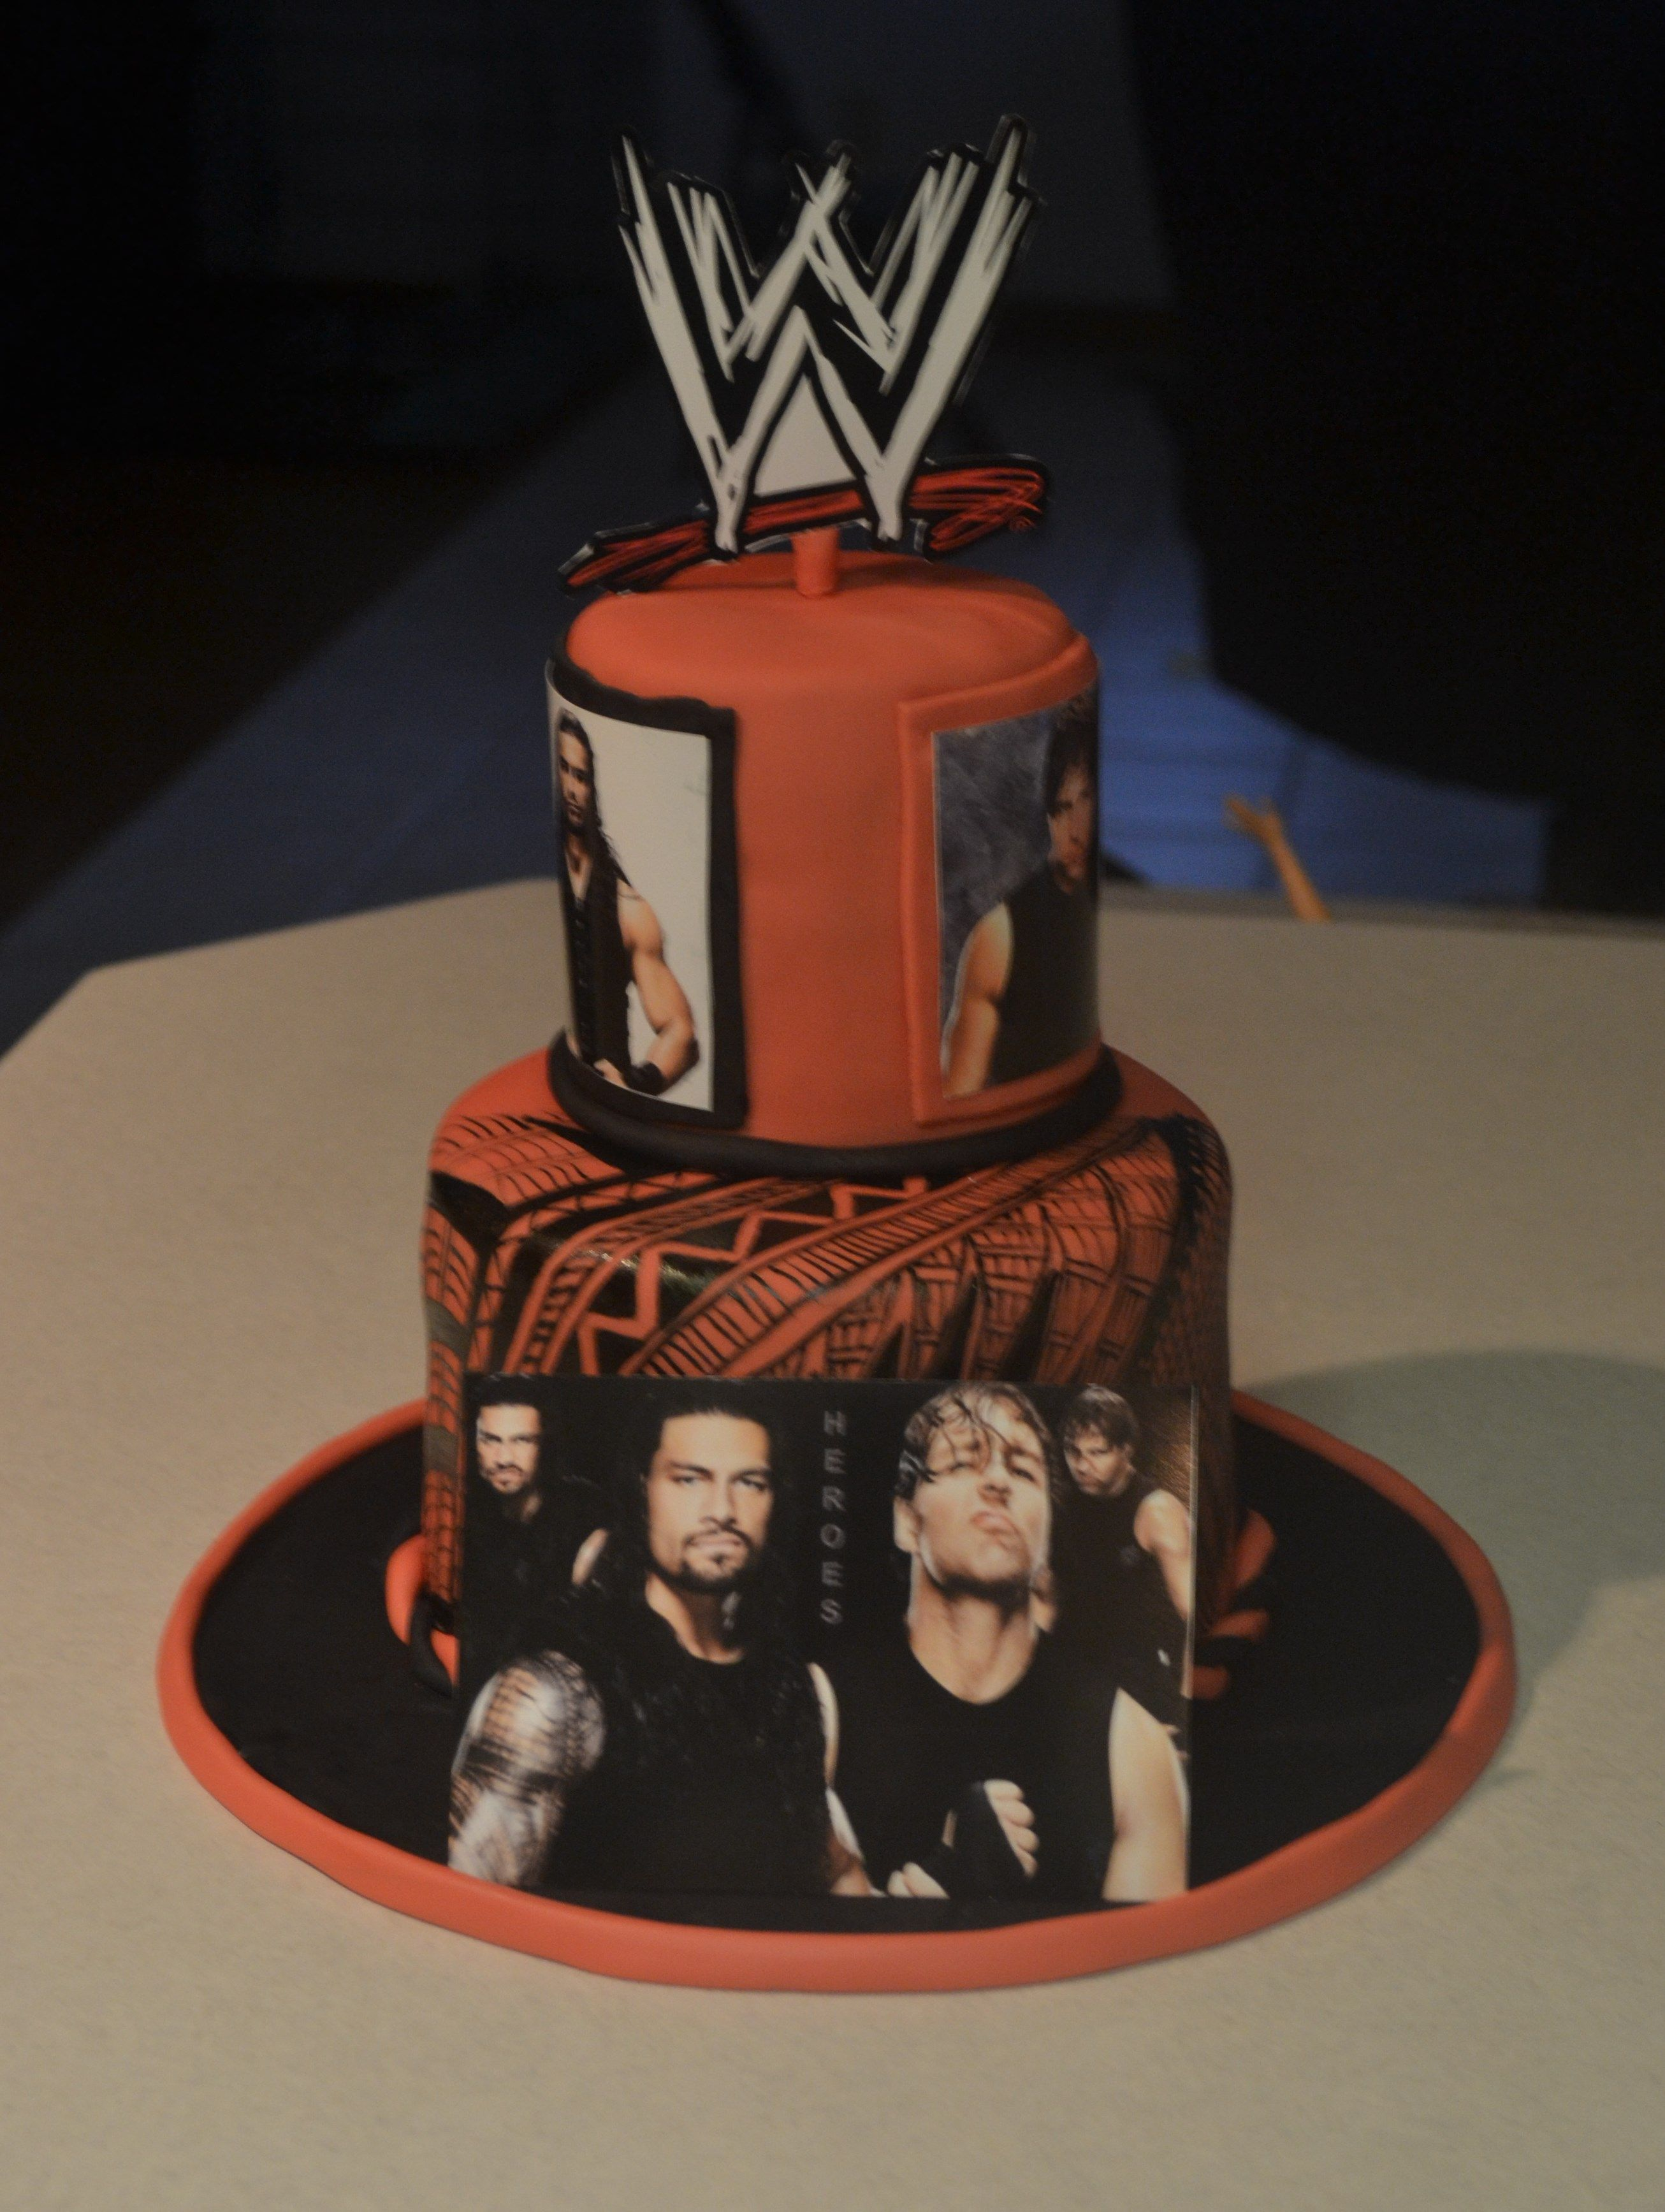 WWE cake Best of Both Worlds Pinterest Wwe cake Cake and